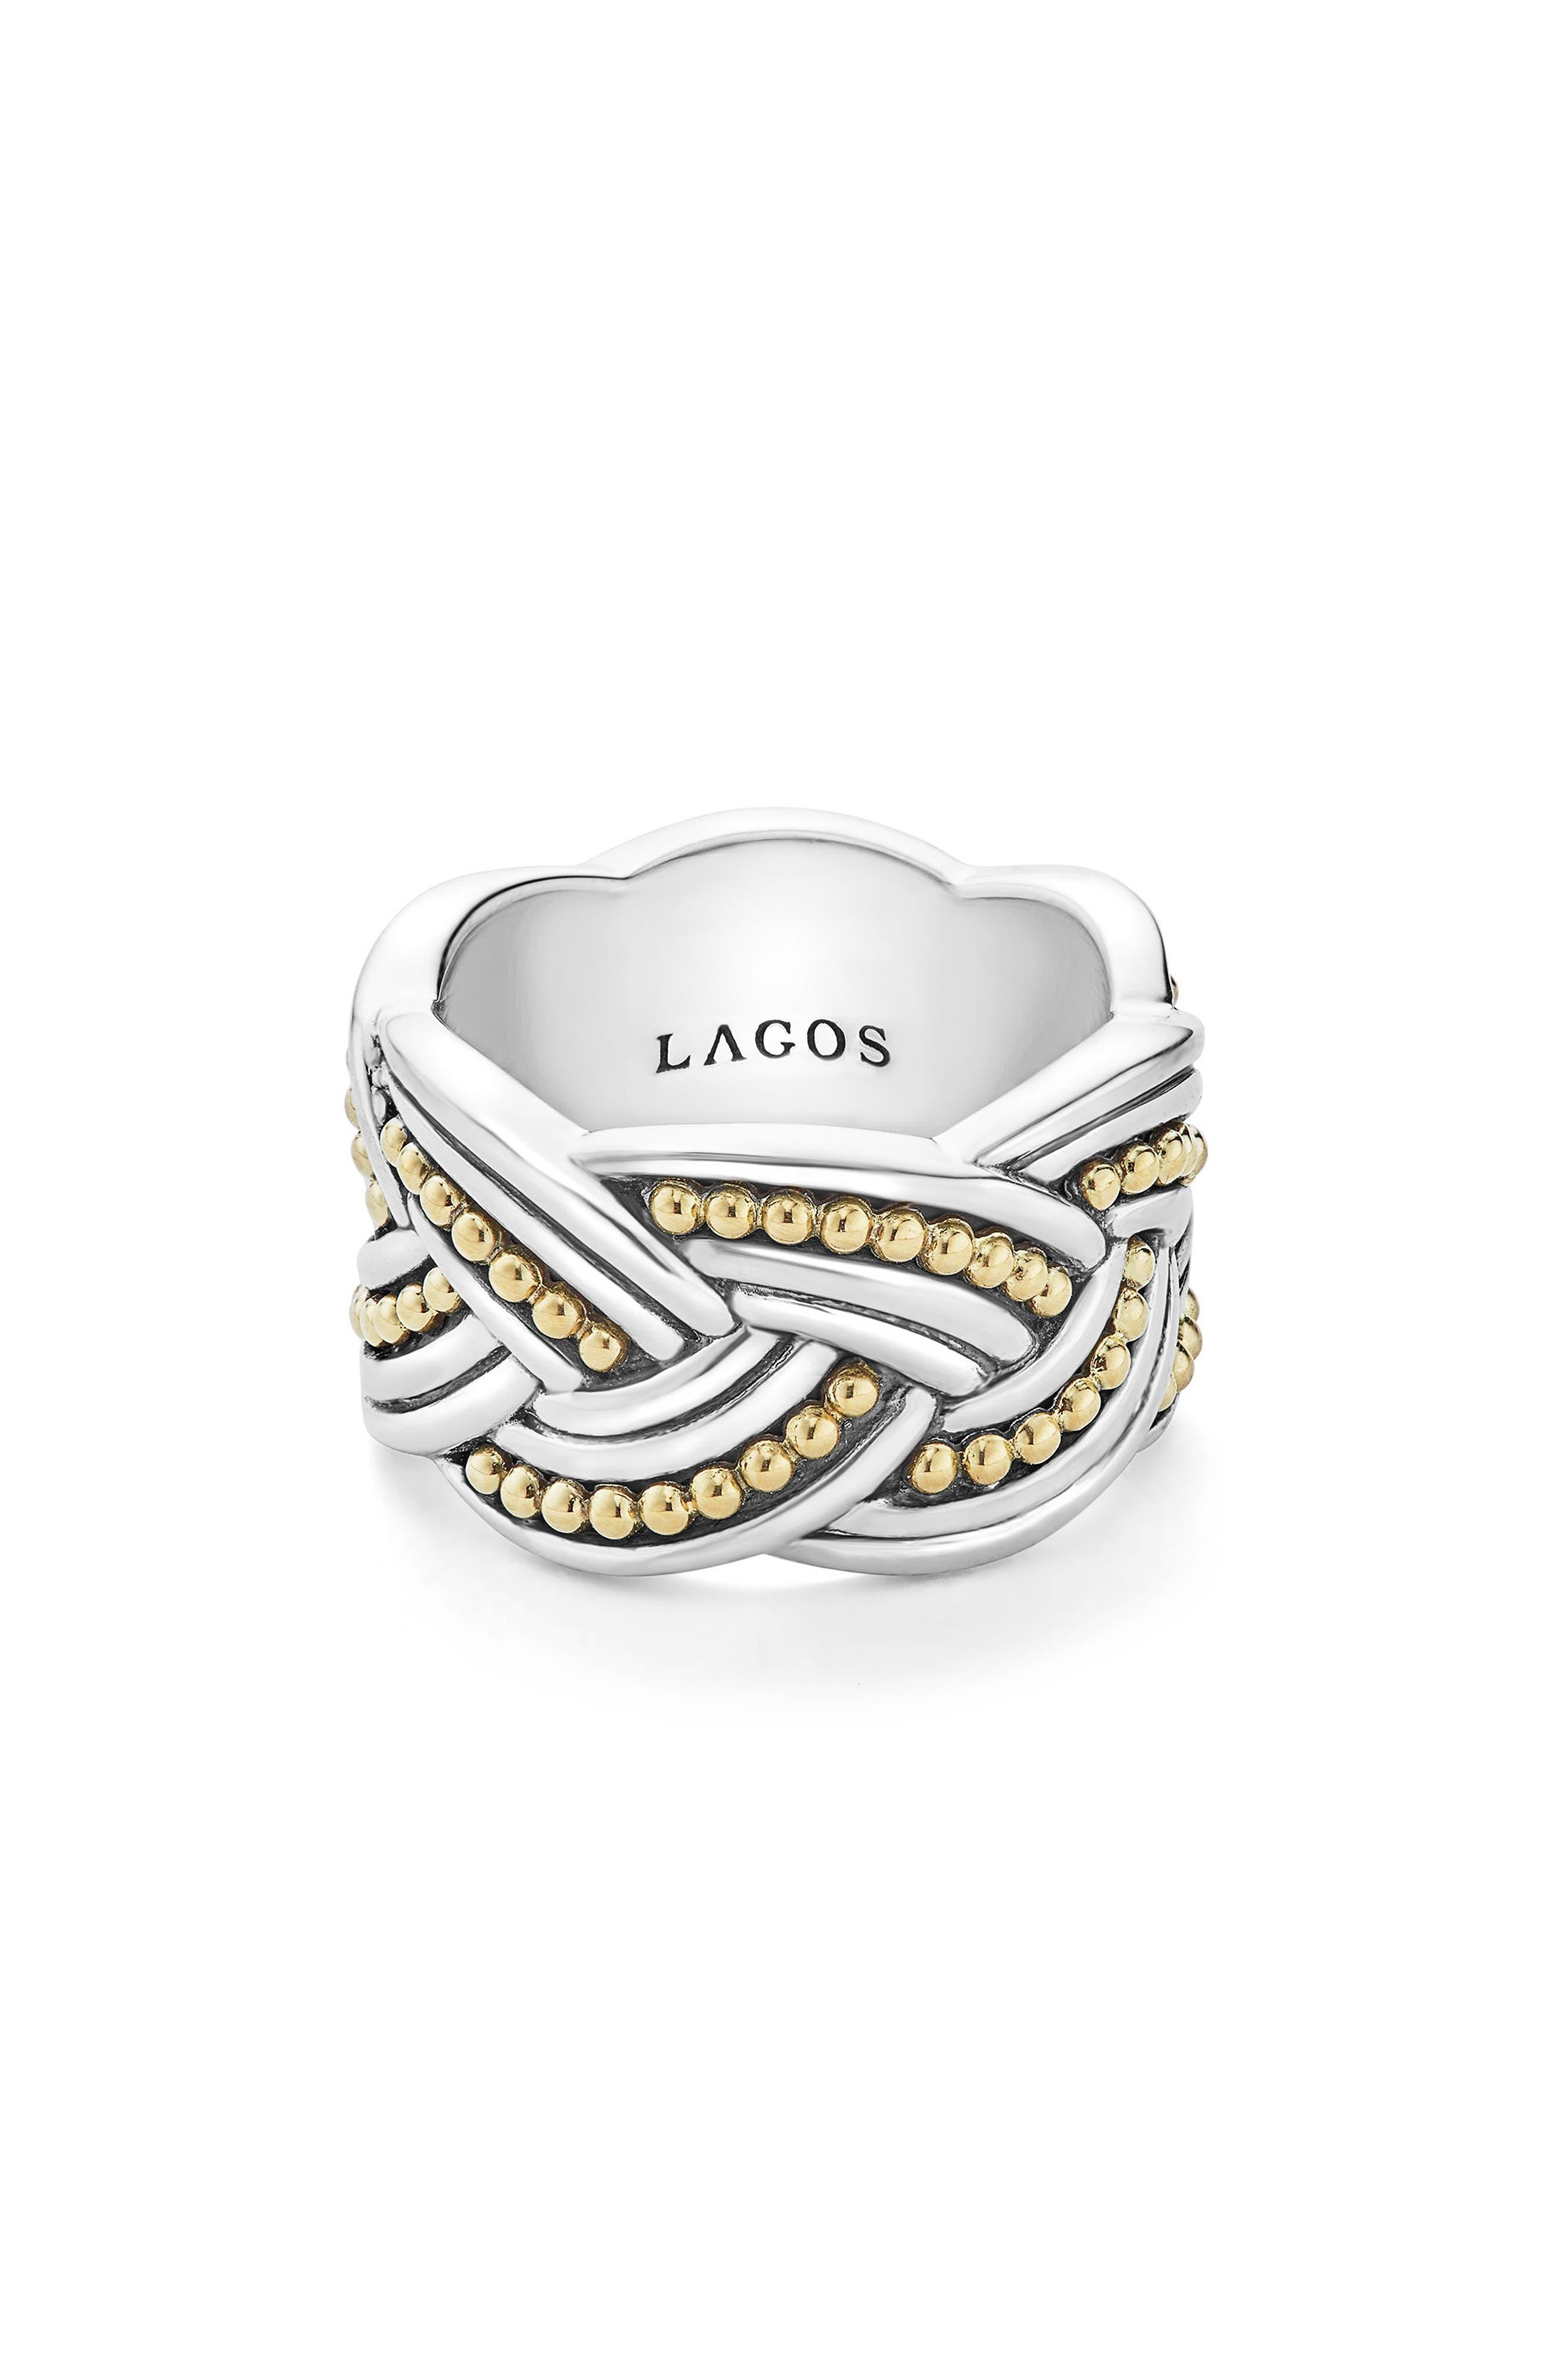 LAGOS Torsade Knot Ring